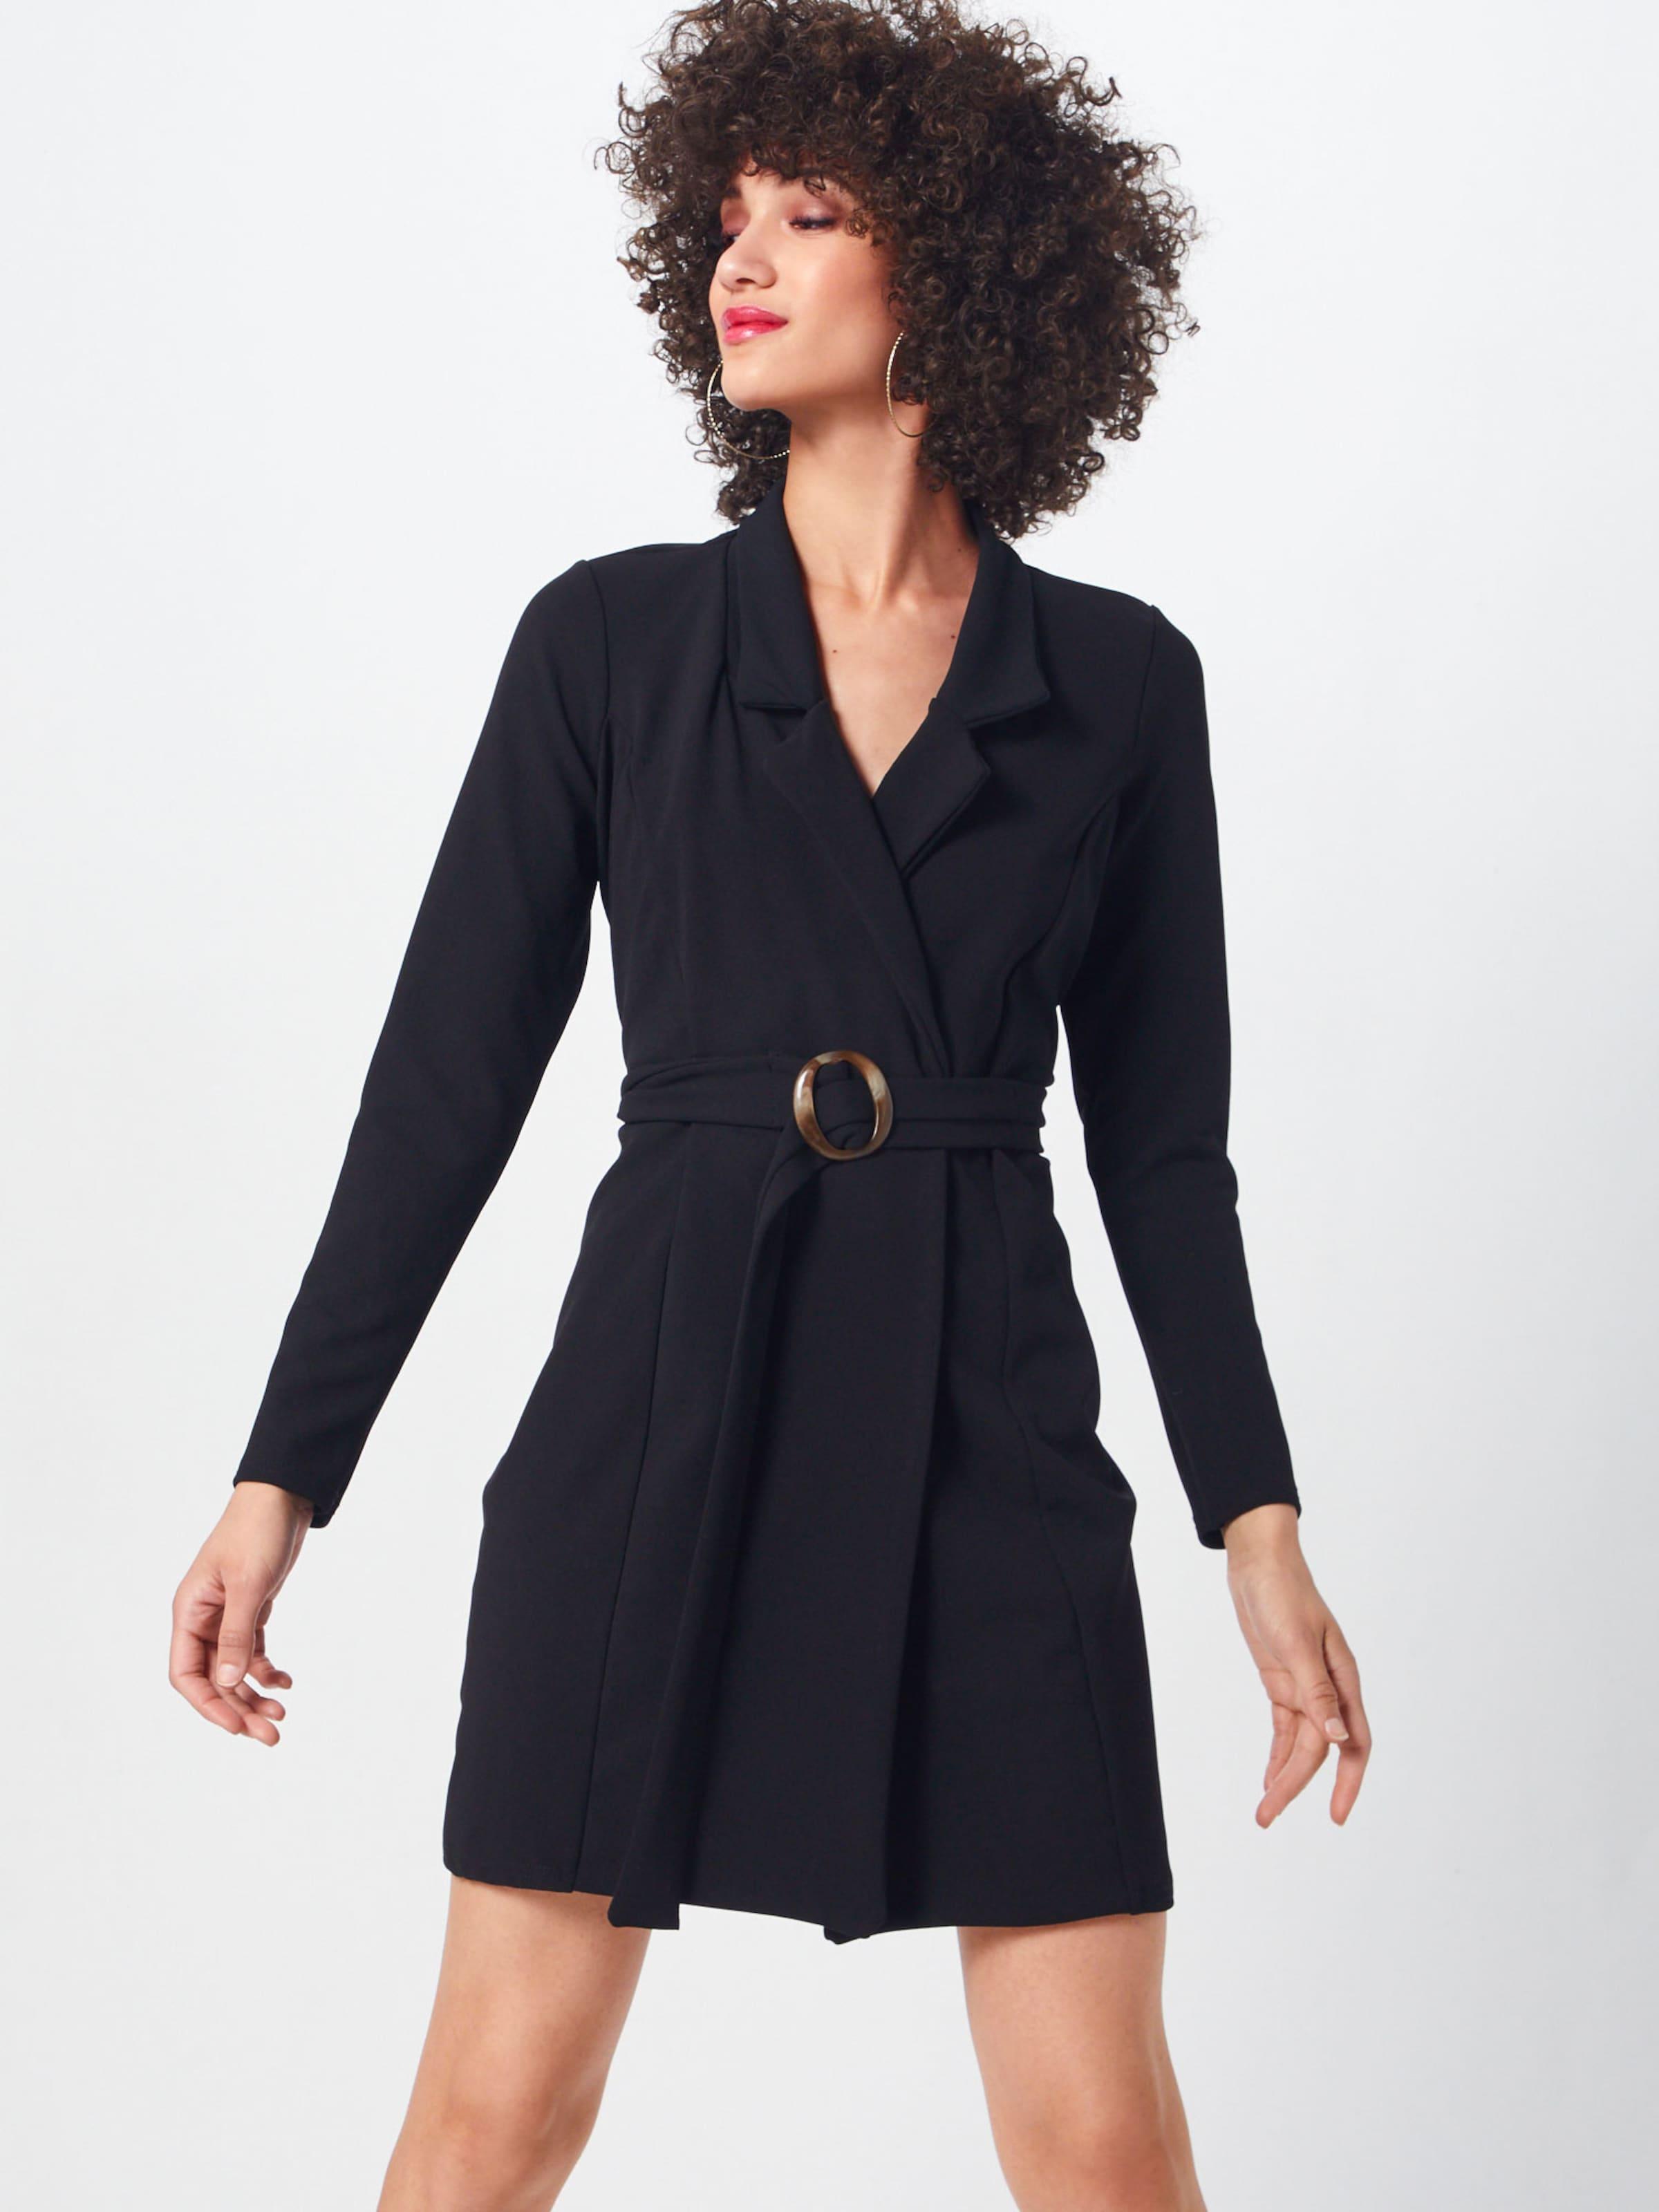 tortoise' Blazer Dress Missguided Sleeve Robe 'long Belted En Noir uKlTF1Jc3